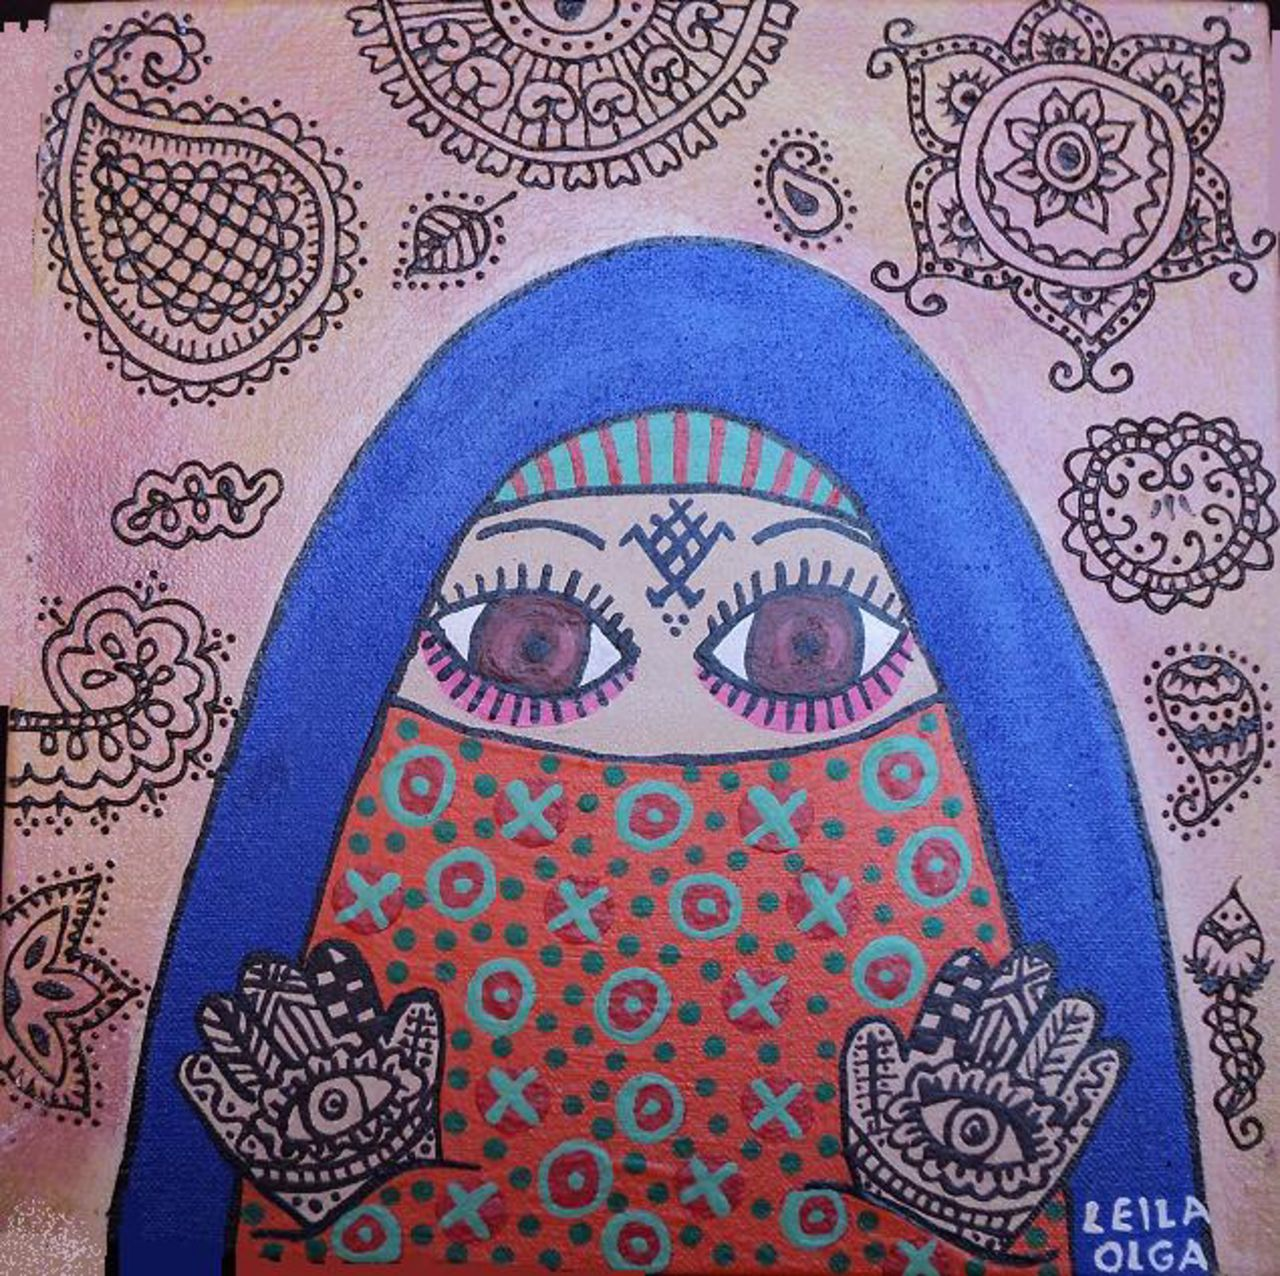 Olga  Leila La femme au henné